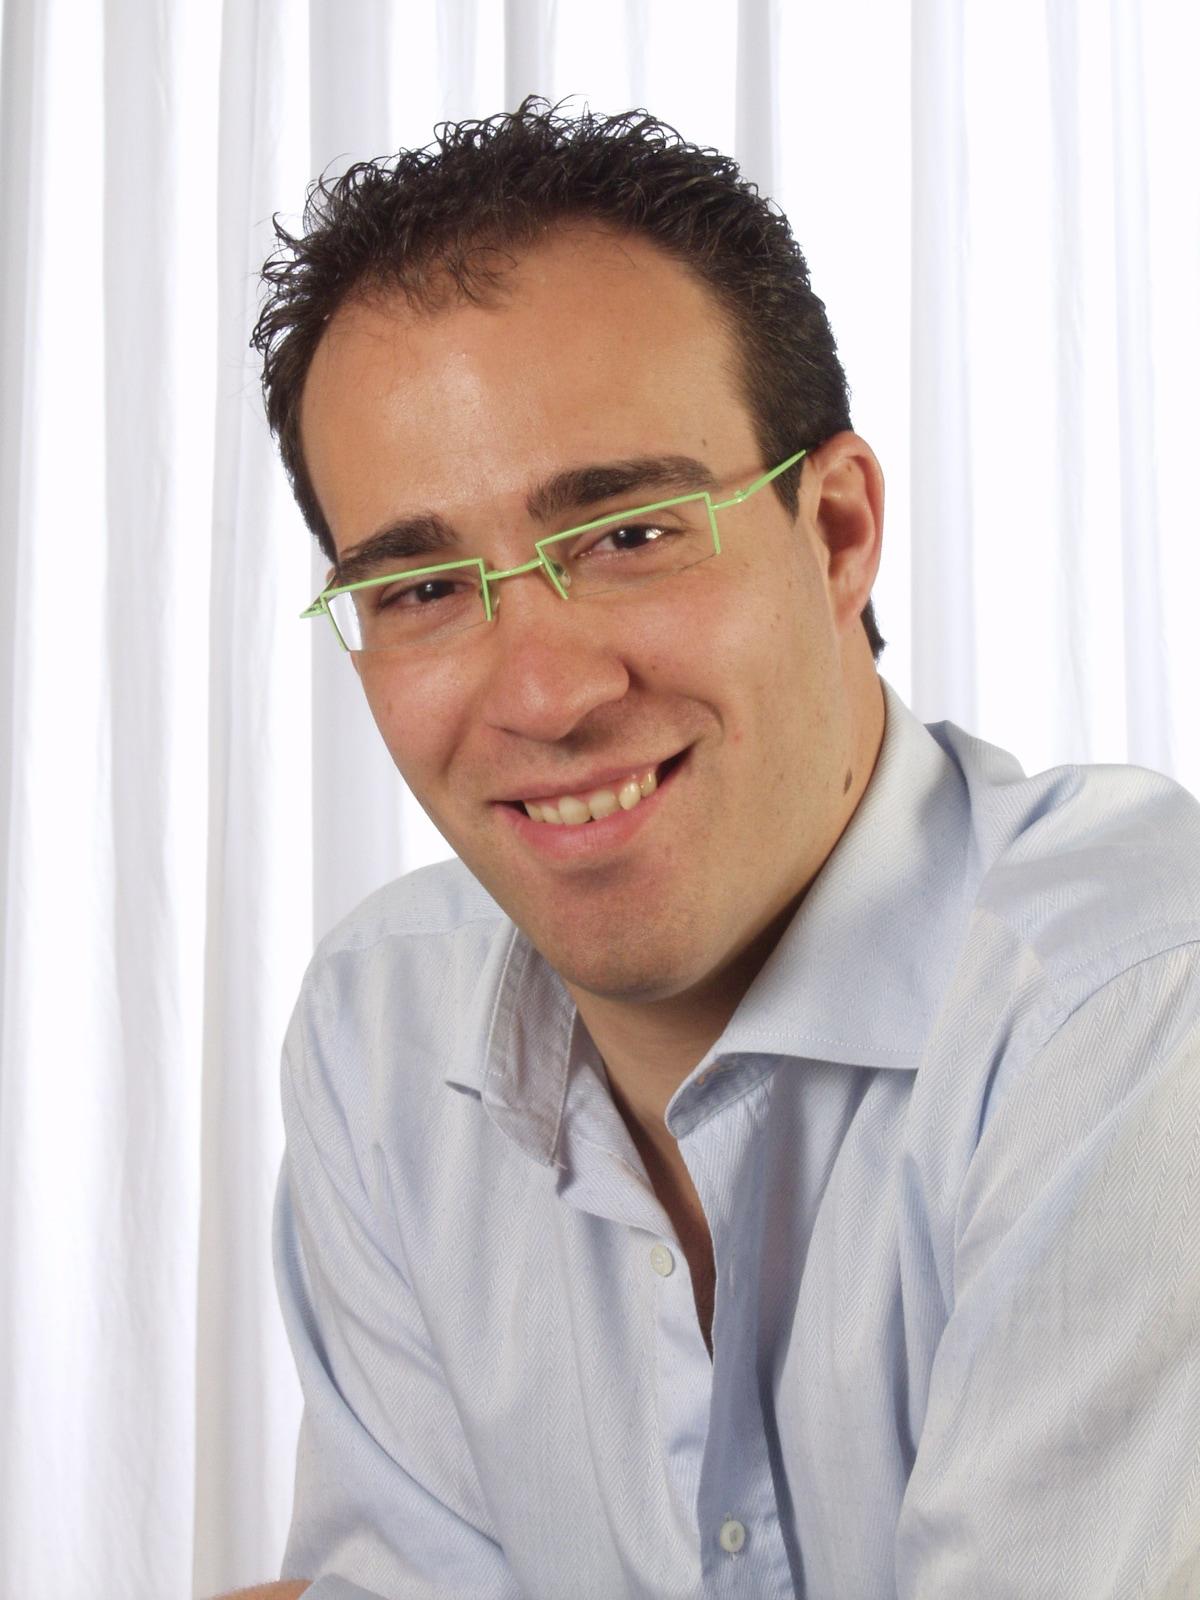 Claudio From Milan, Italy